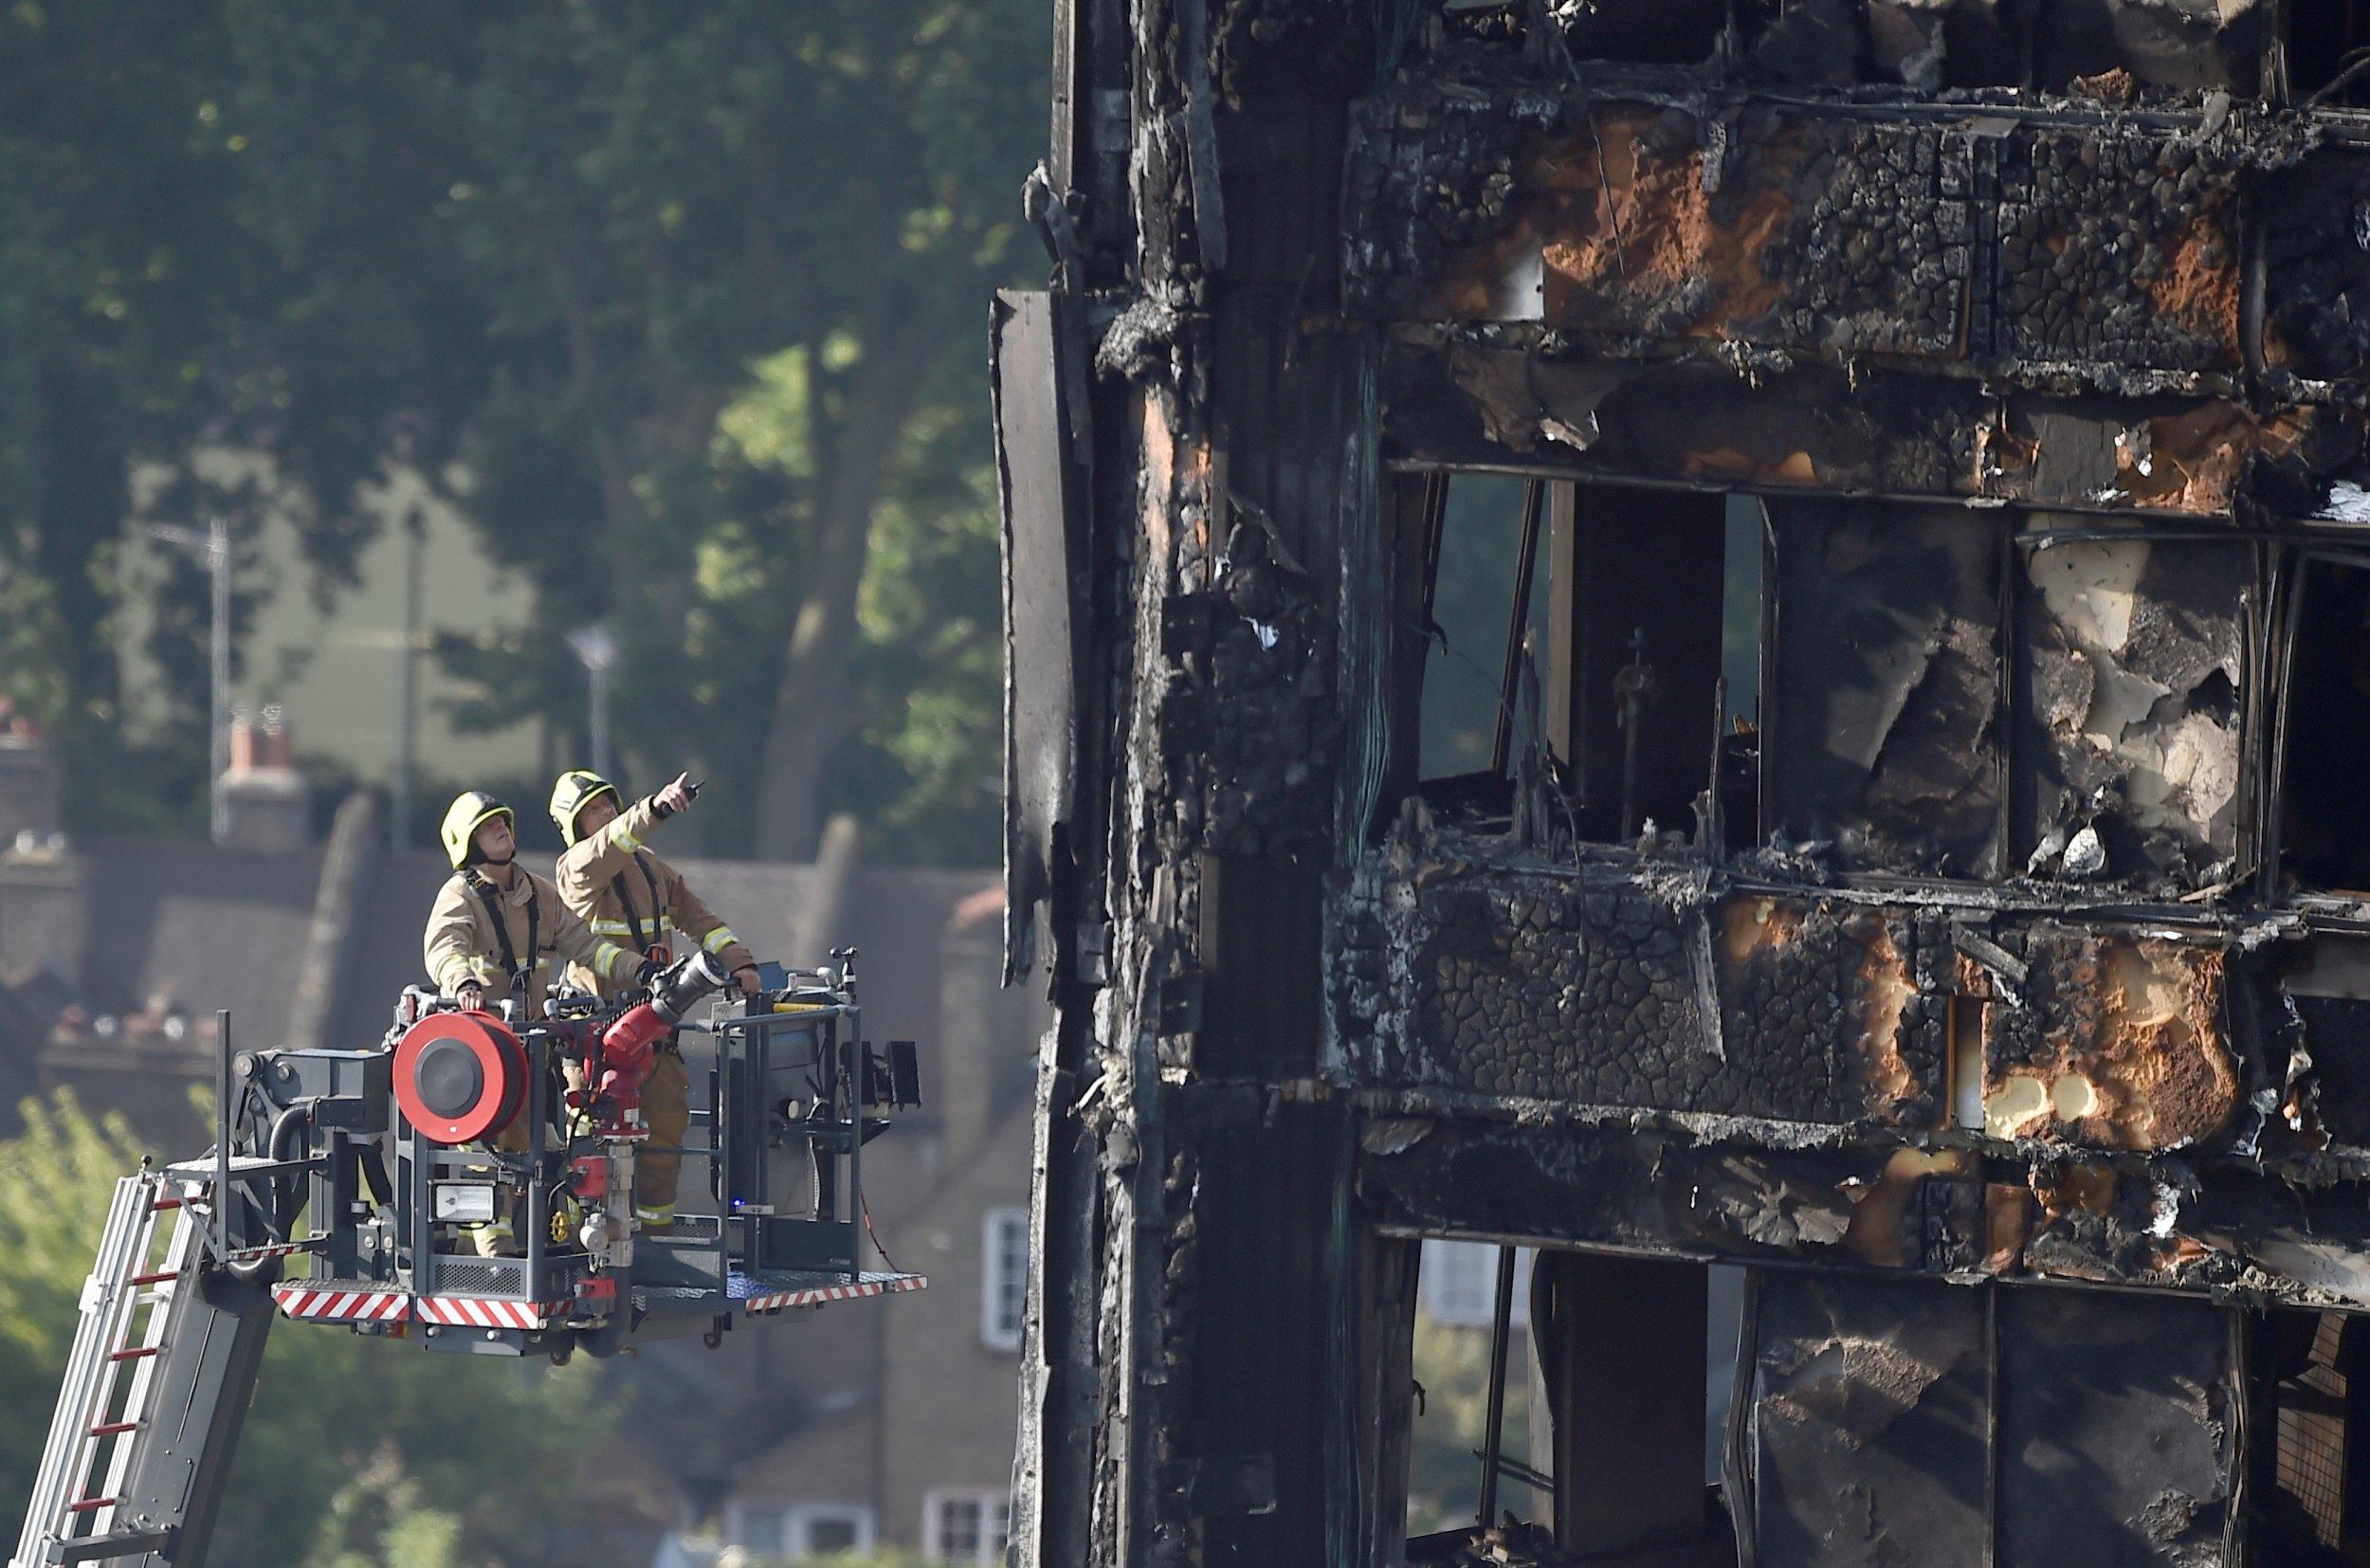 06_16_Grenfell_London_drones